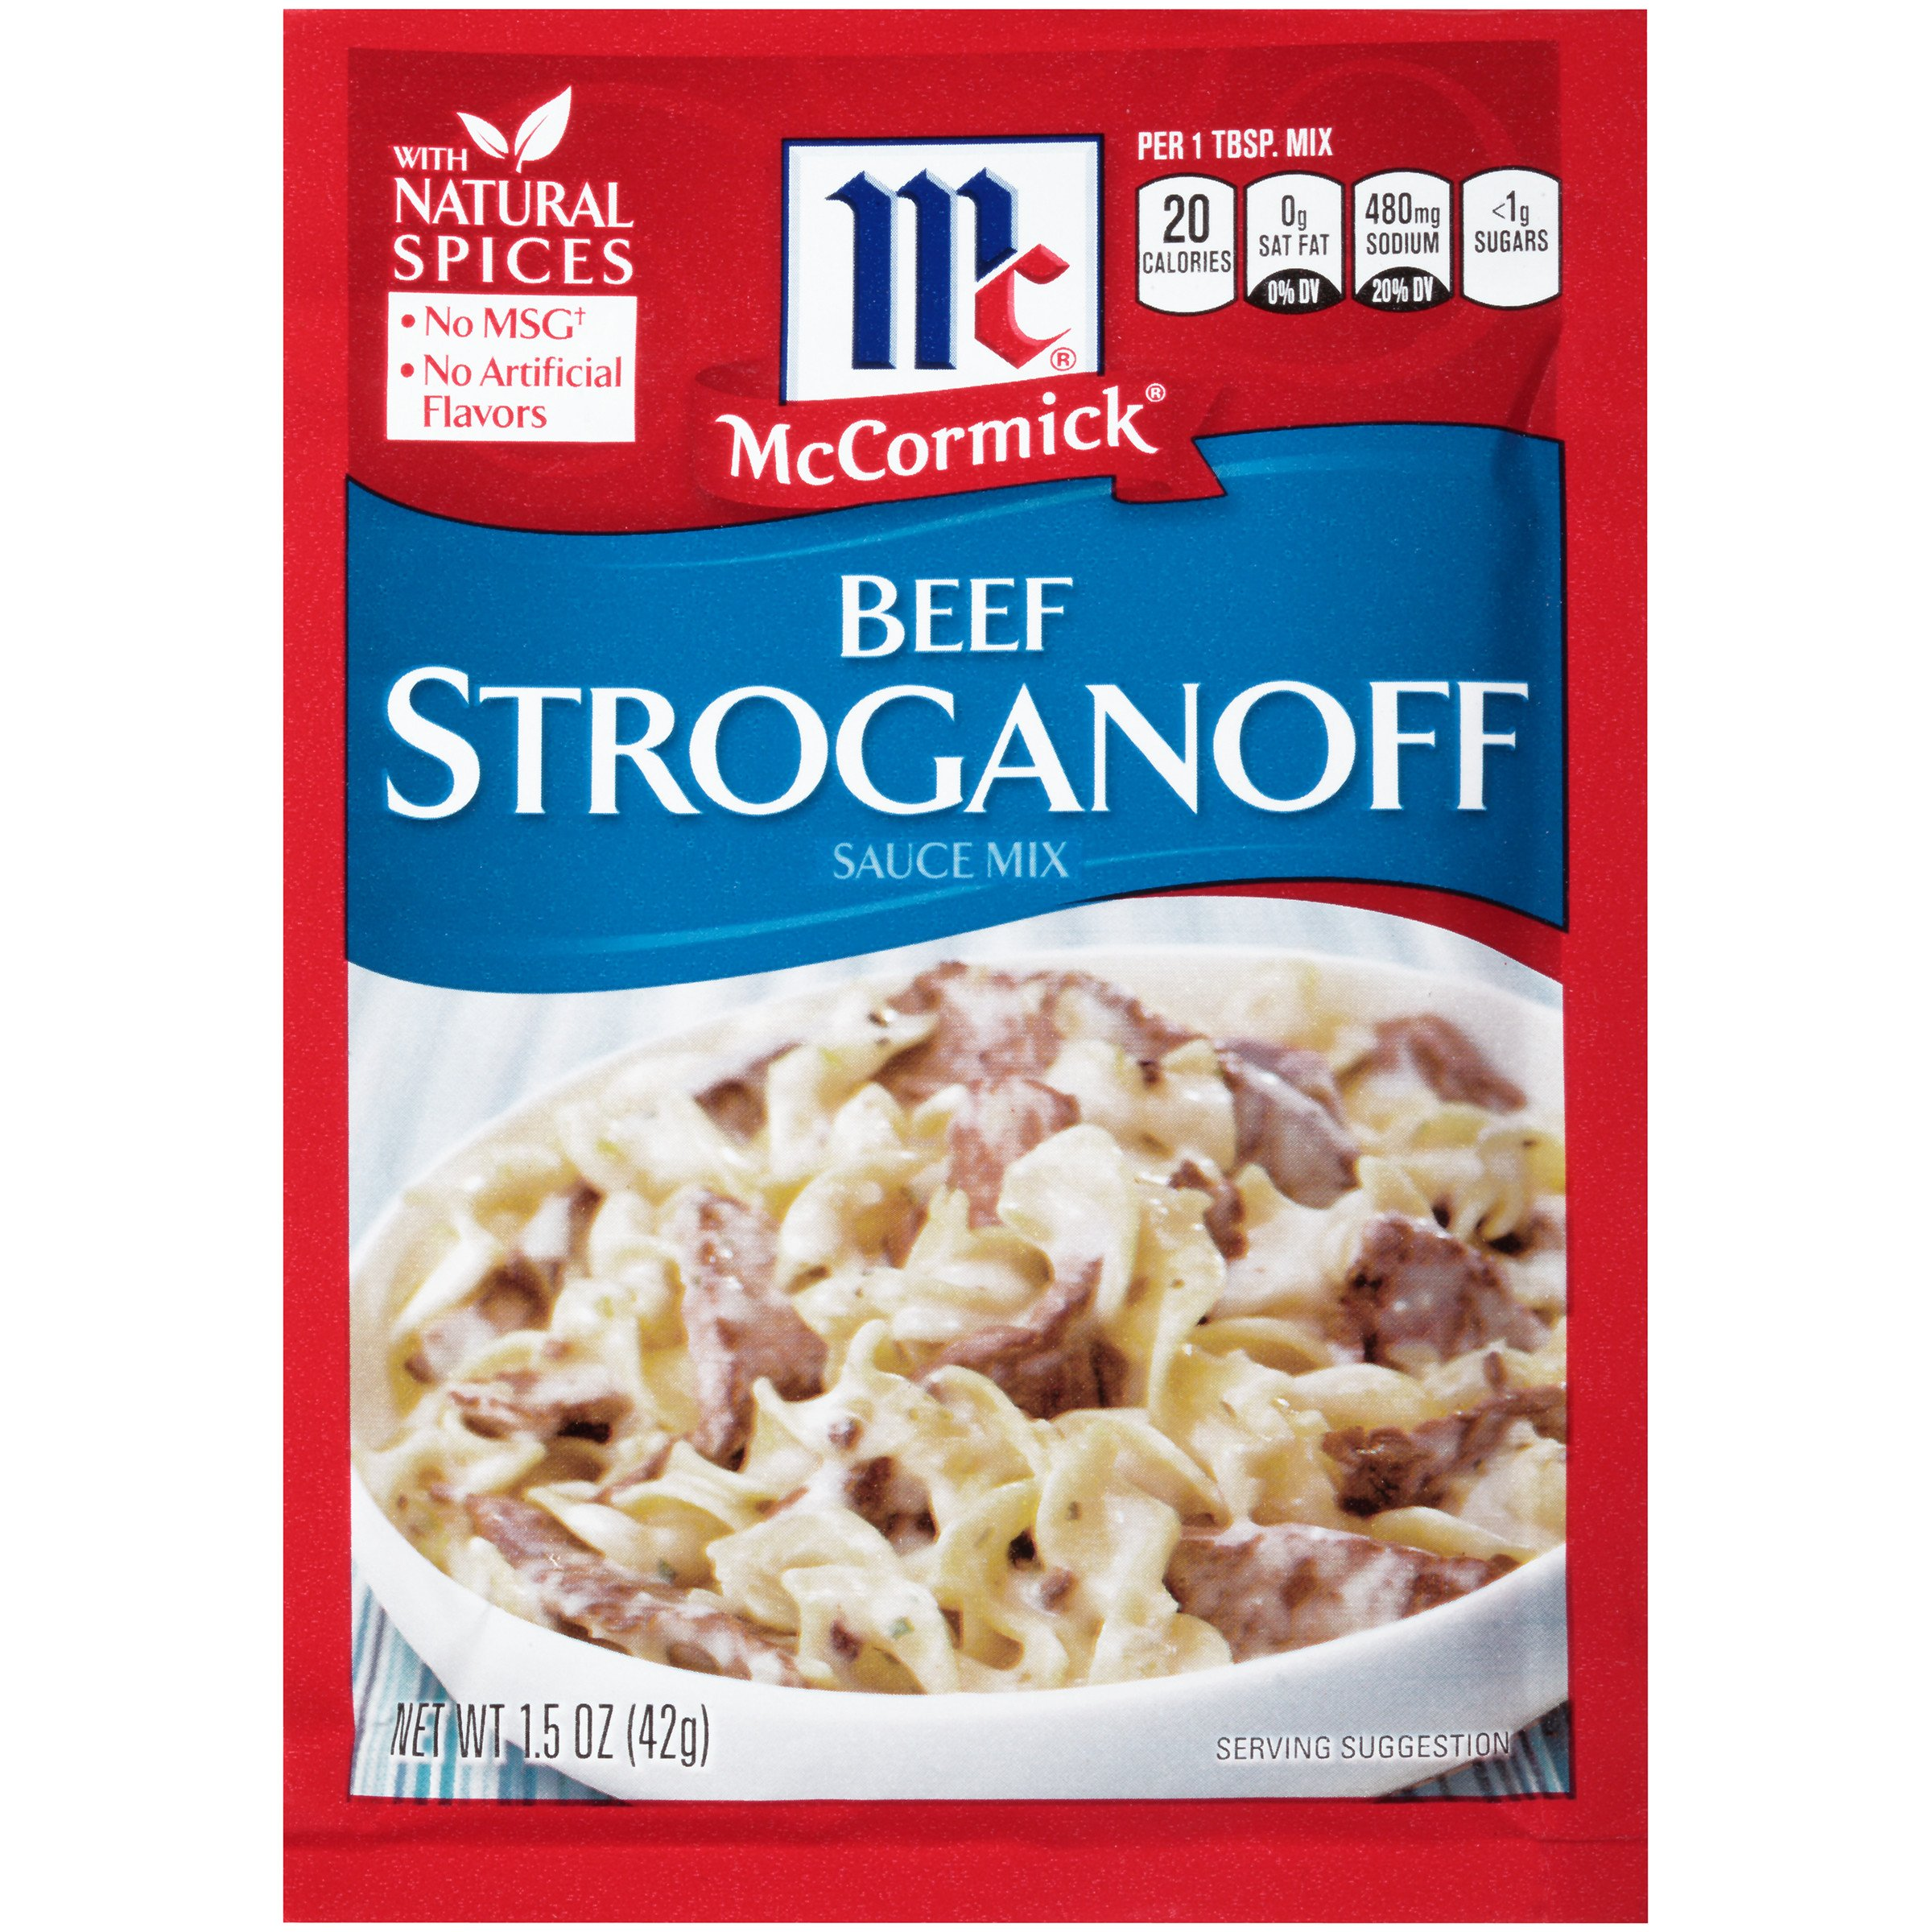 McCormick Beef Stroganoff Seasoning Mix, 1.5 oz by McCormick (Image #1)